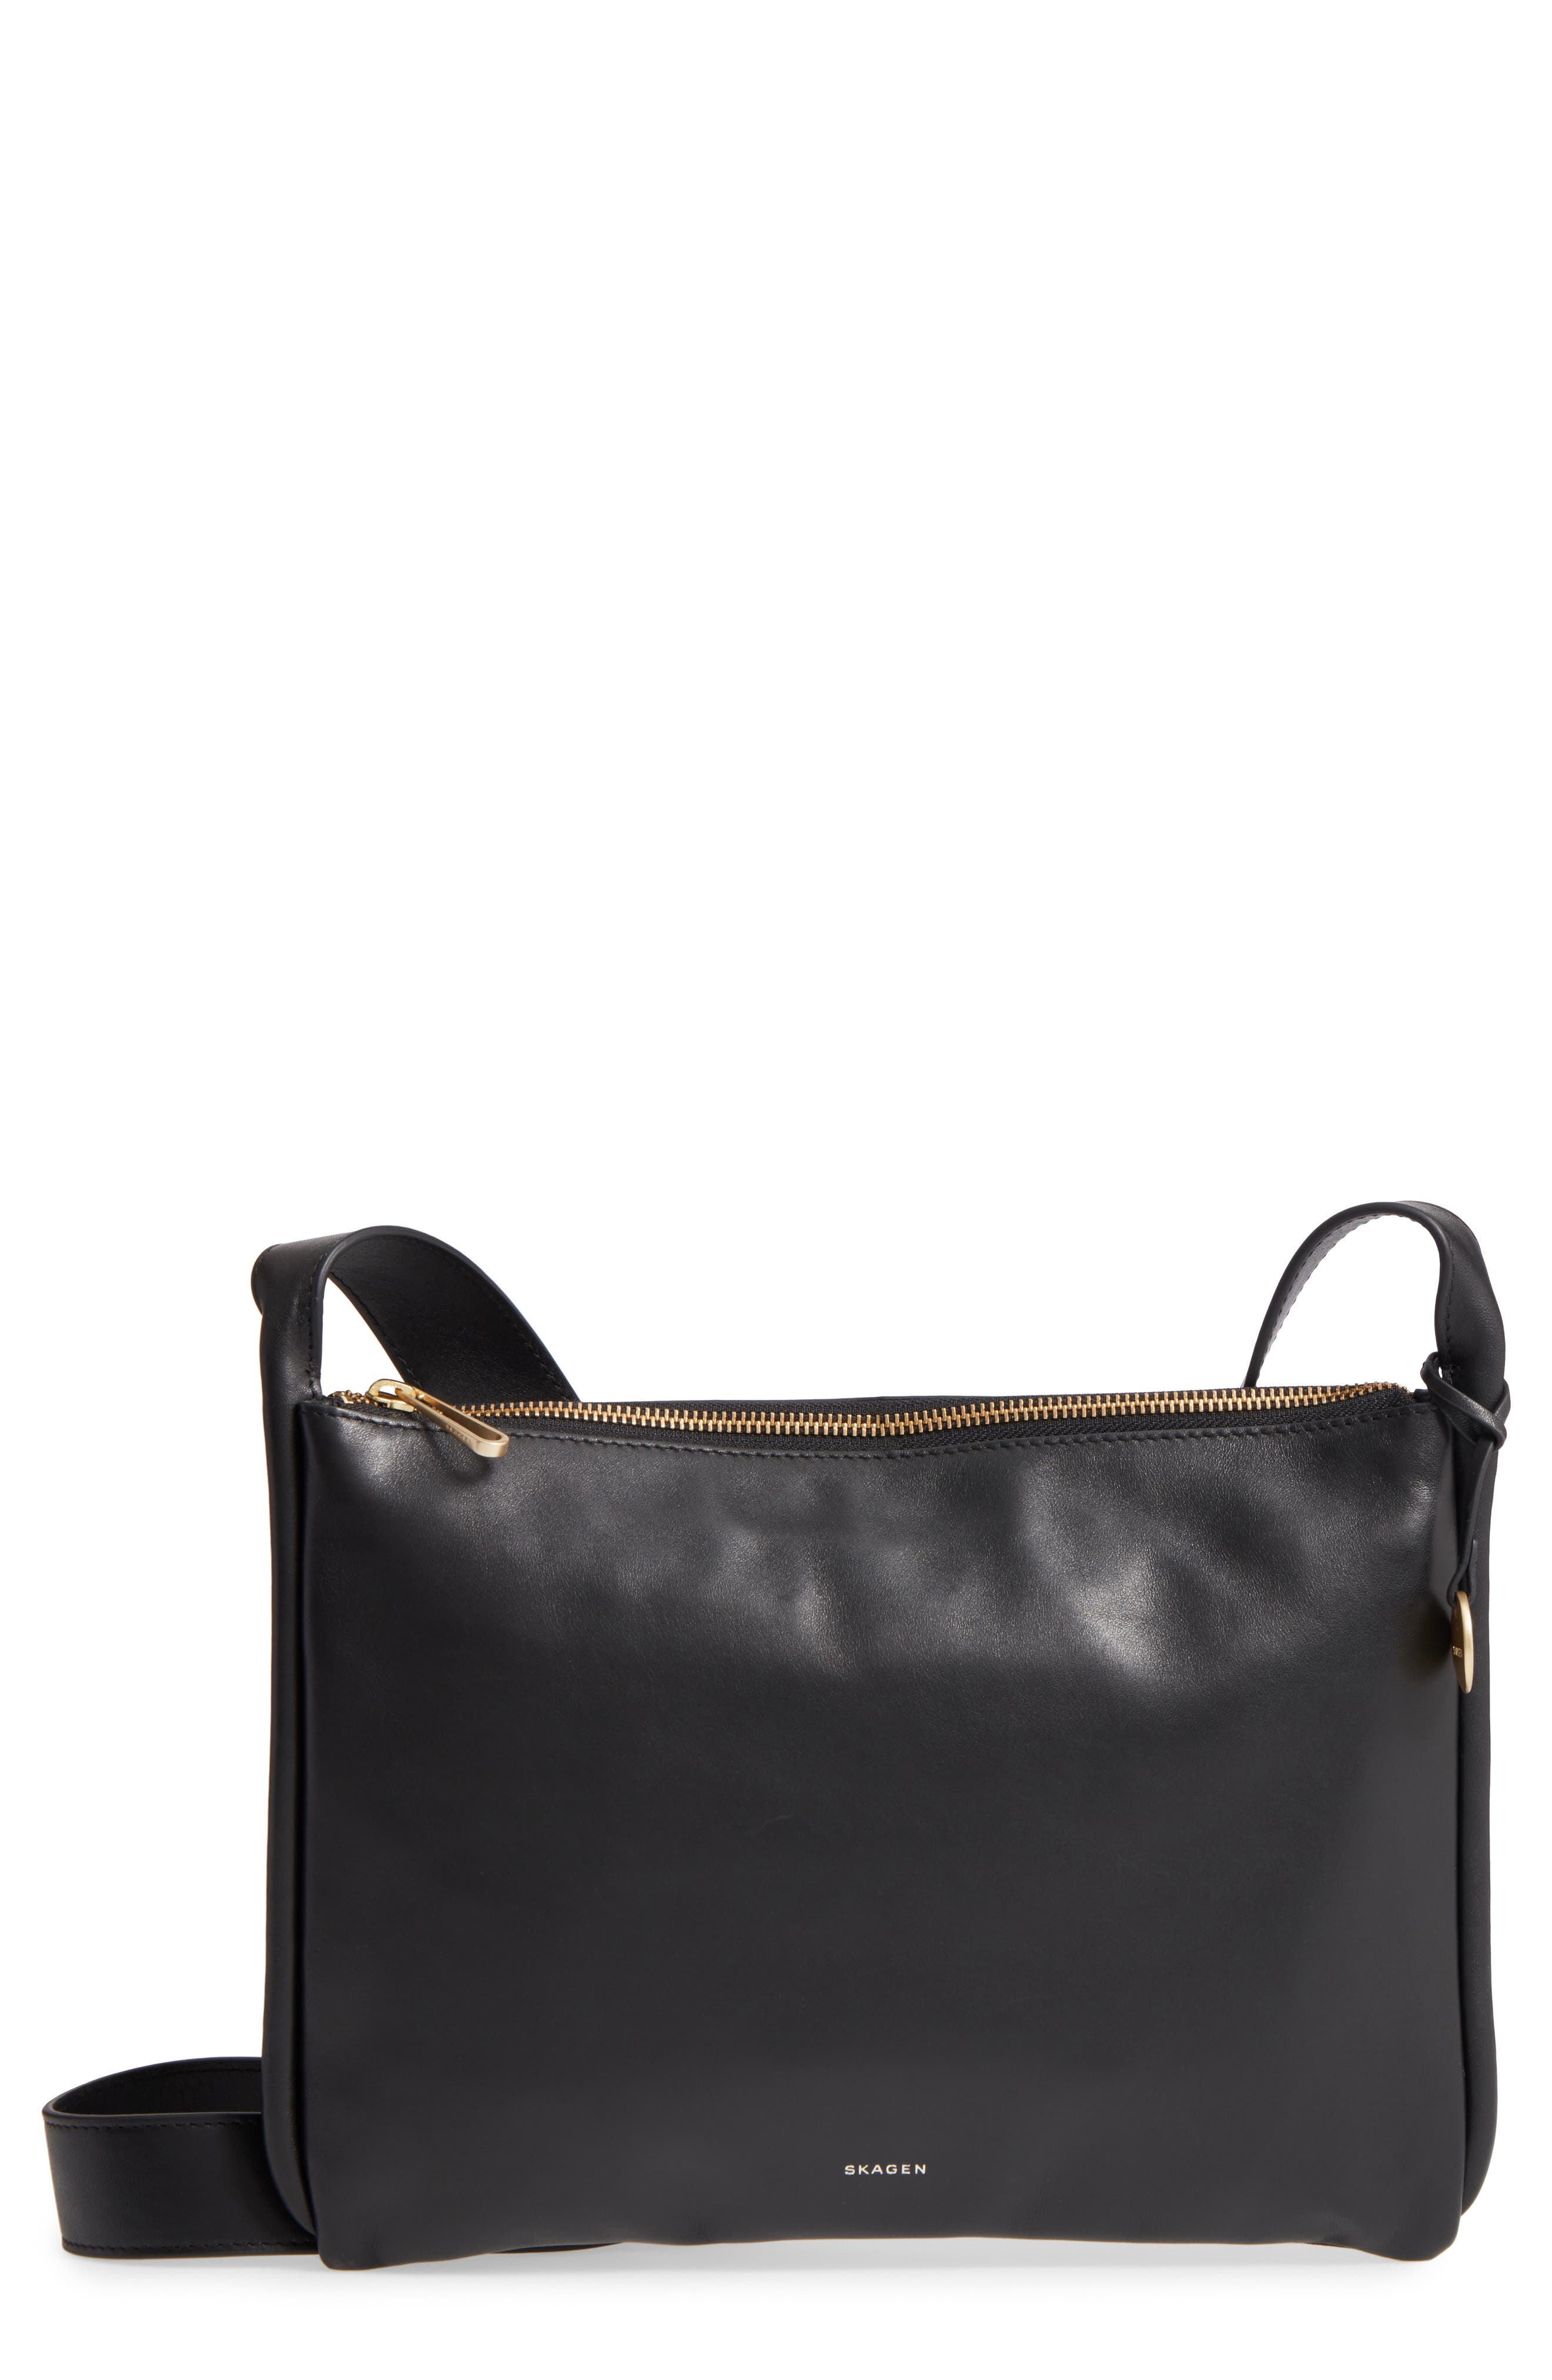 Skagen Slim Anesa Leather Crossbody Bag